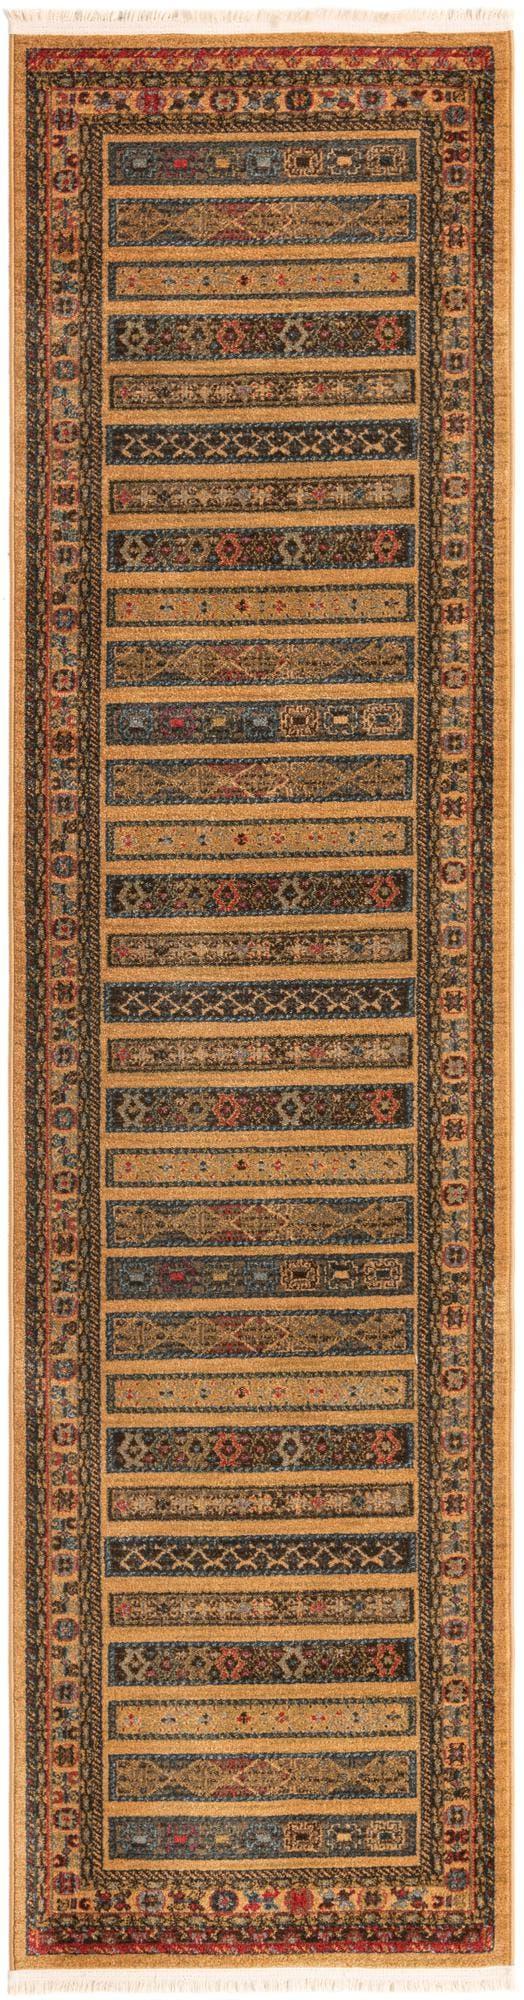 2' 7 x 10' Kashkuli Gabbeh Runner Rug main image